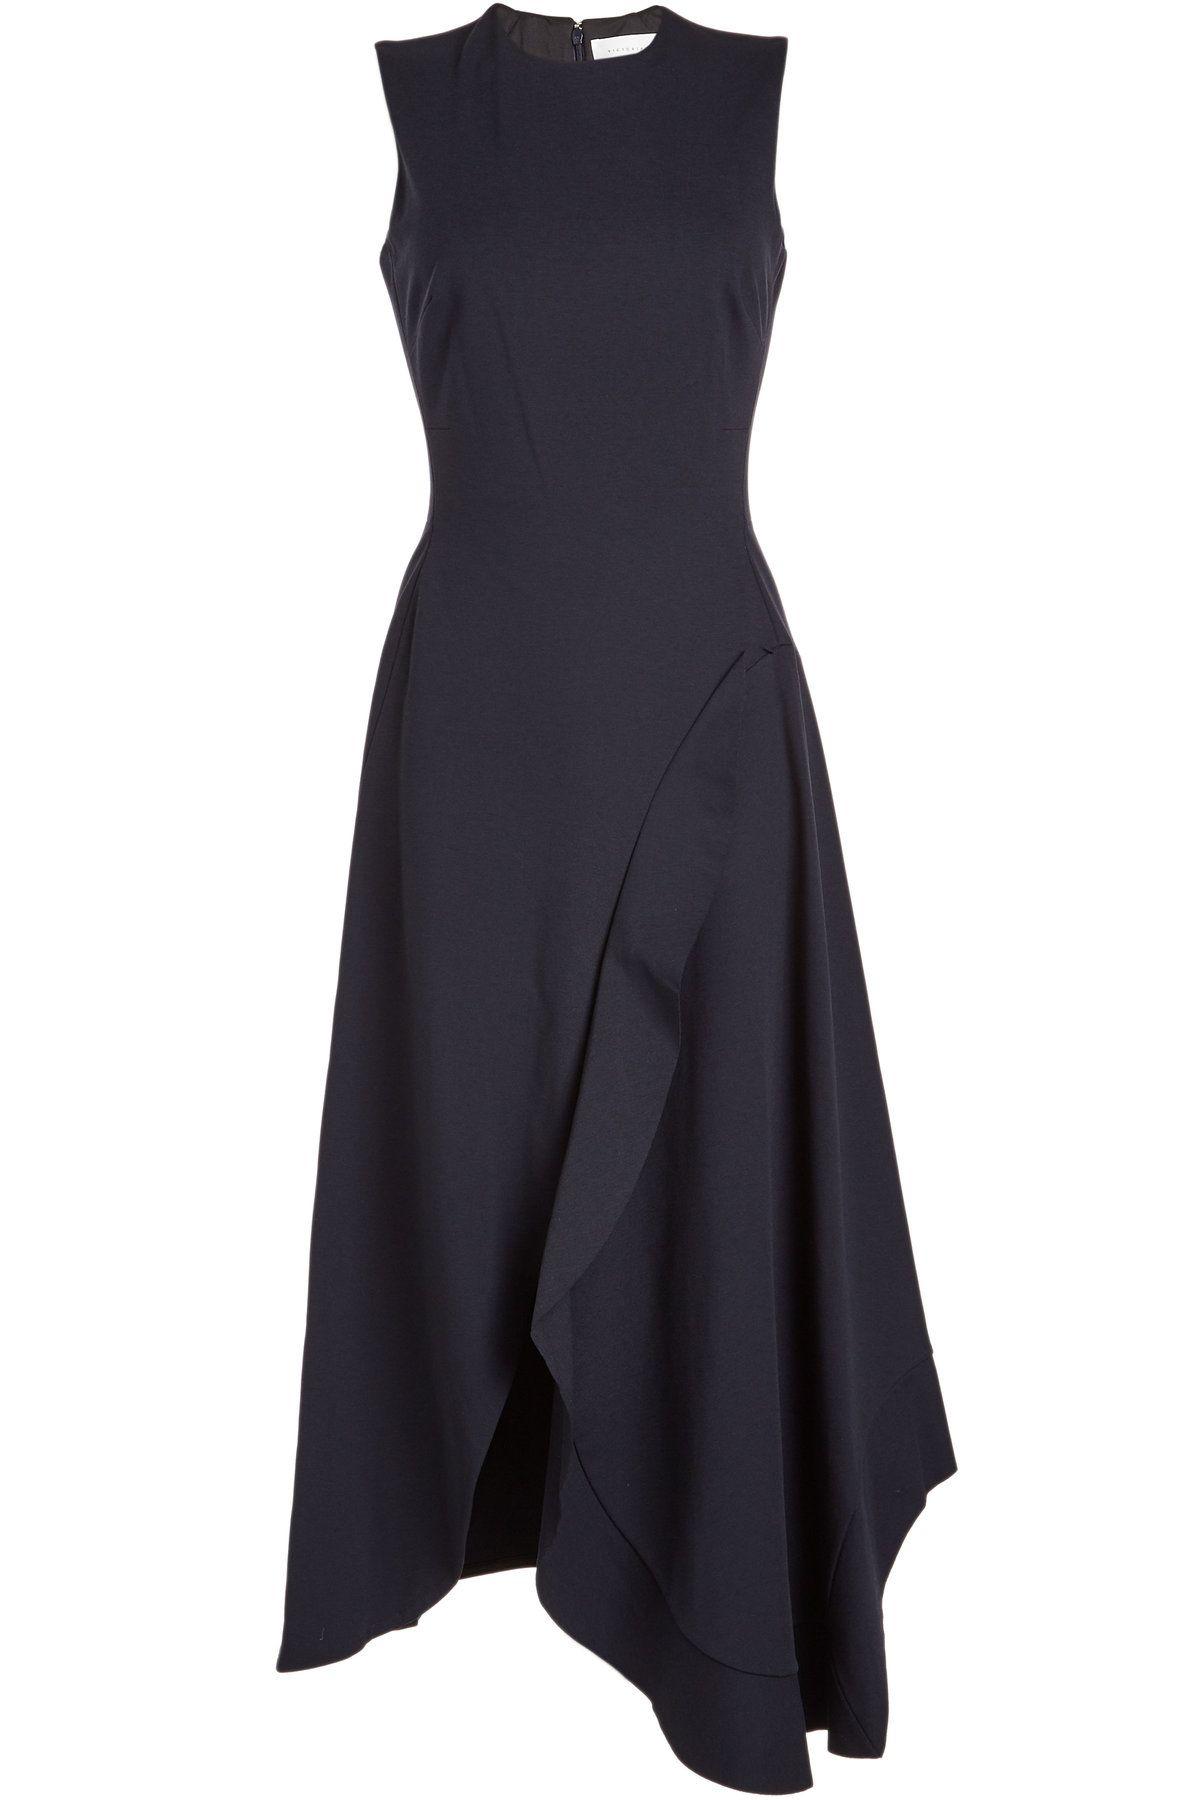 Sleeveless Asymmetric Ruffle Dress In Blue 1505 [ 1800 x 1200 Pixel ]